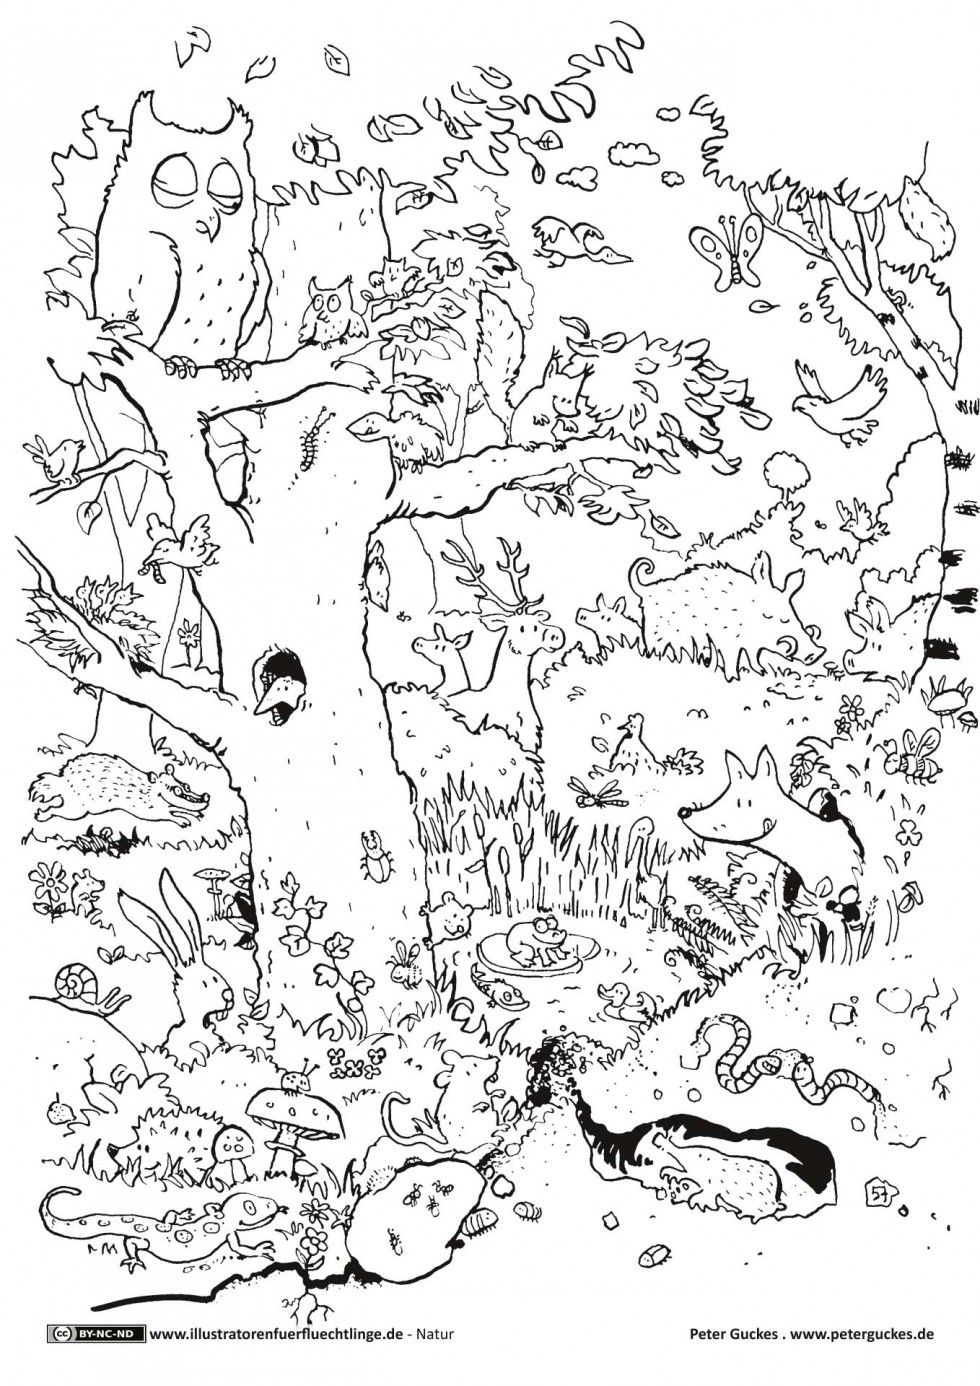 Download als PDF: Natur  Wald Tiere  Guckes ...